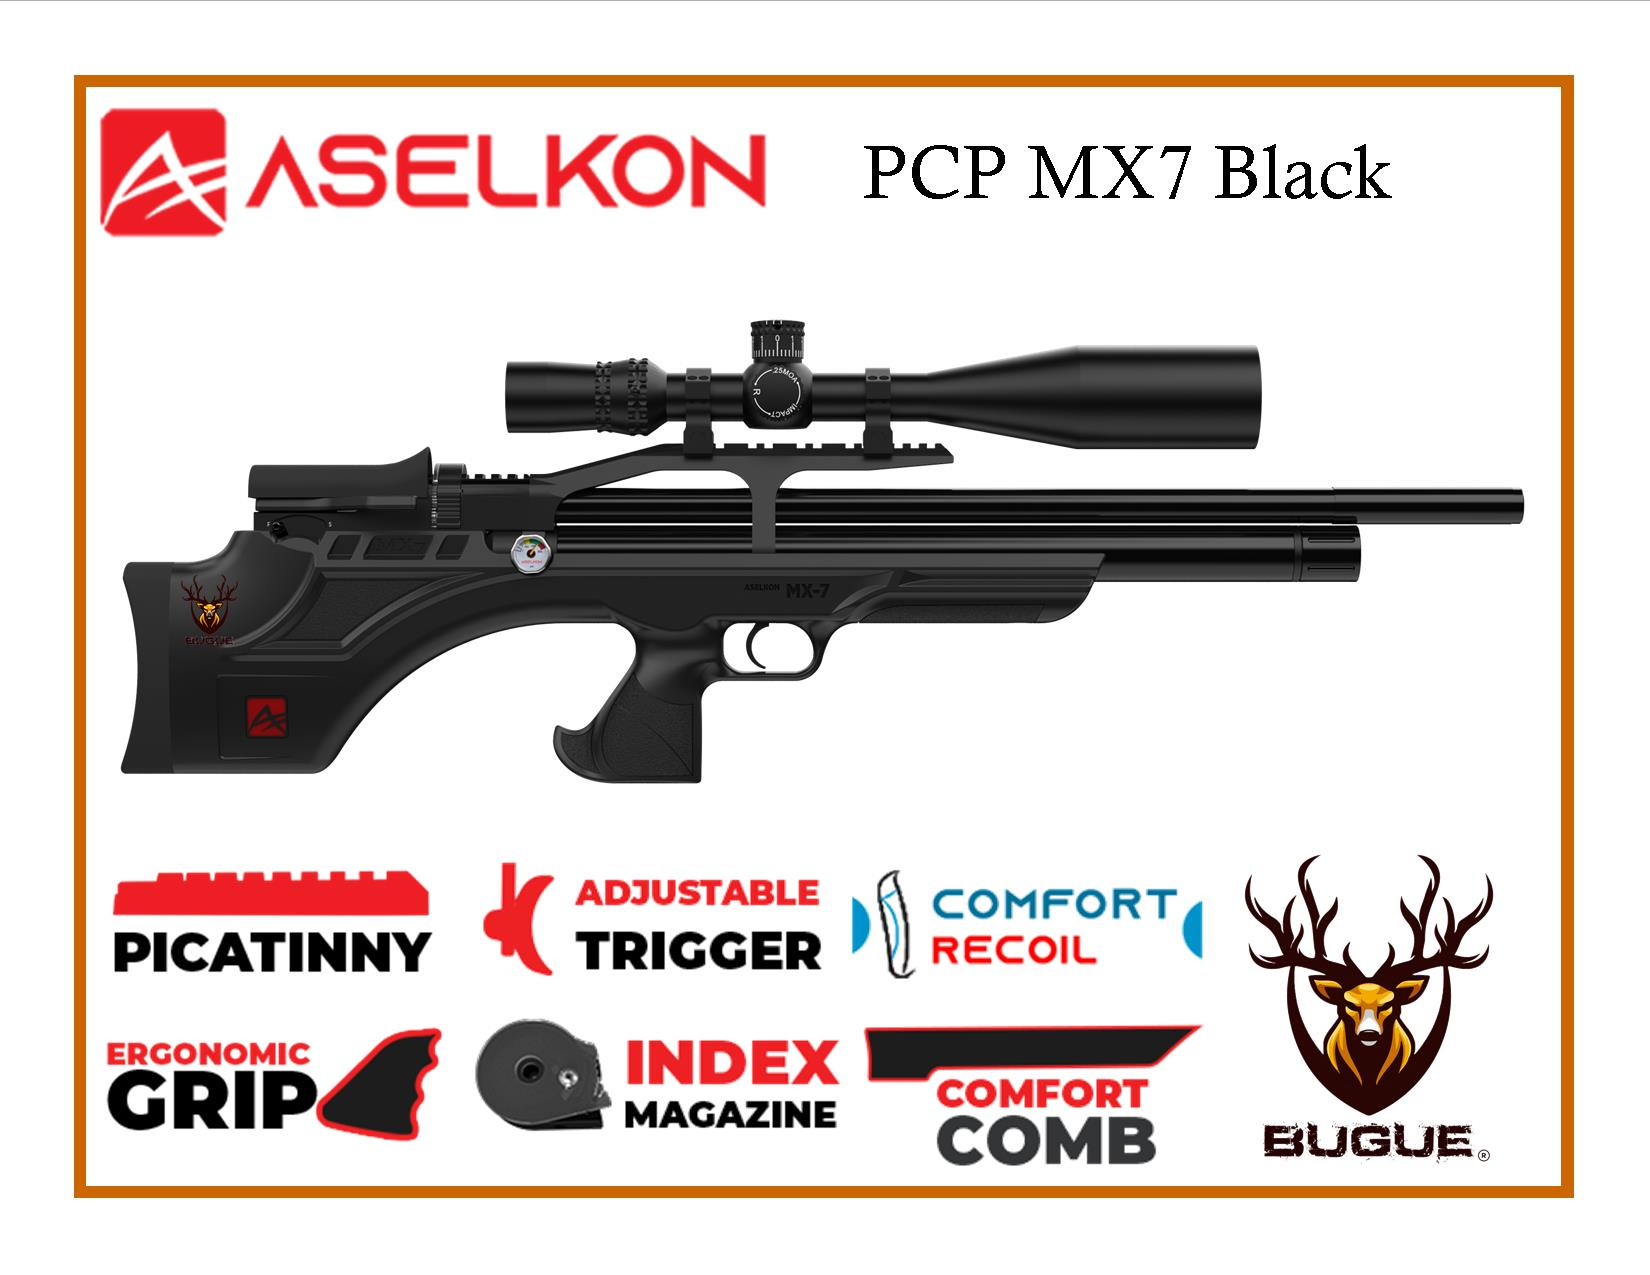 RIFLE PCP ASELKON MX7 BLACK 5.5 MM